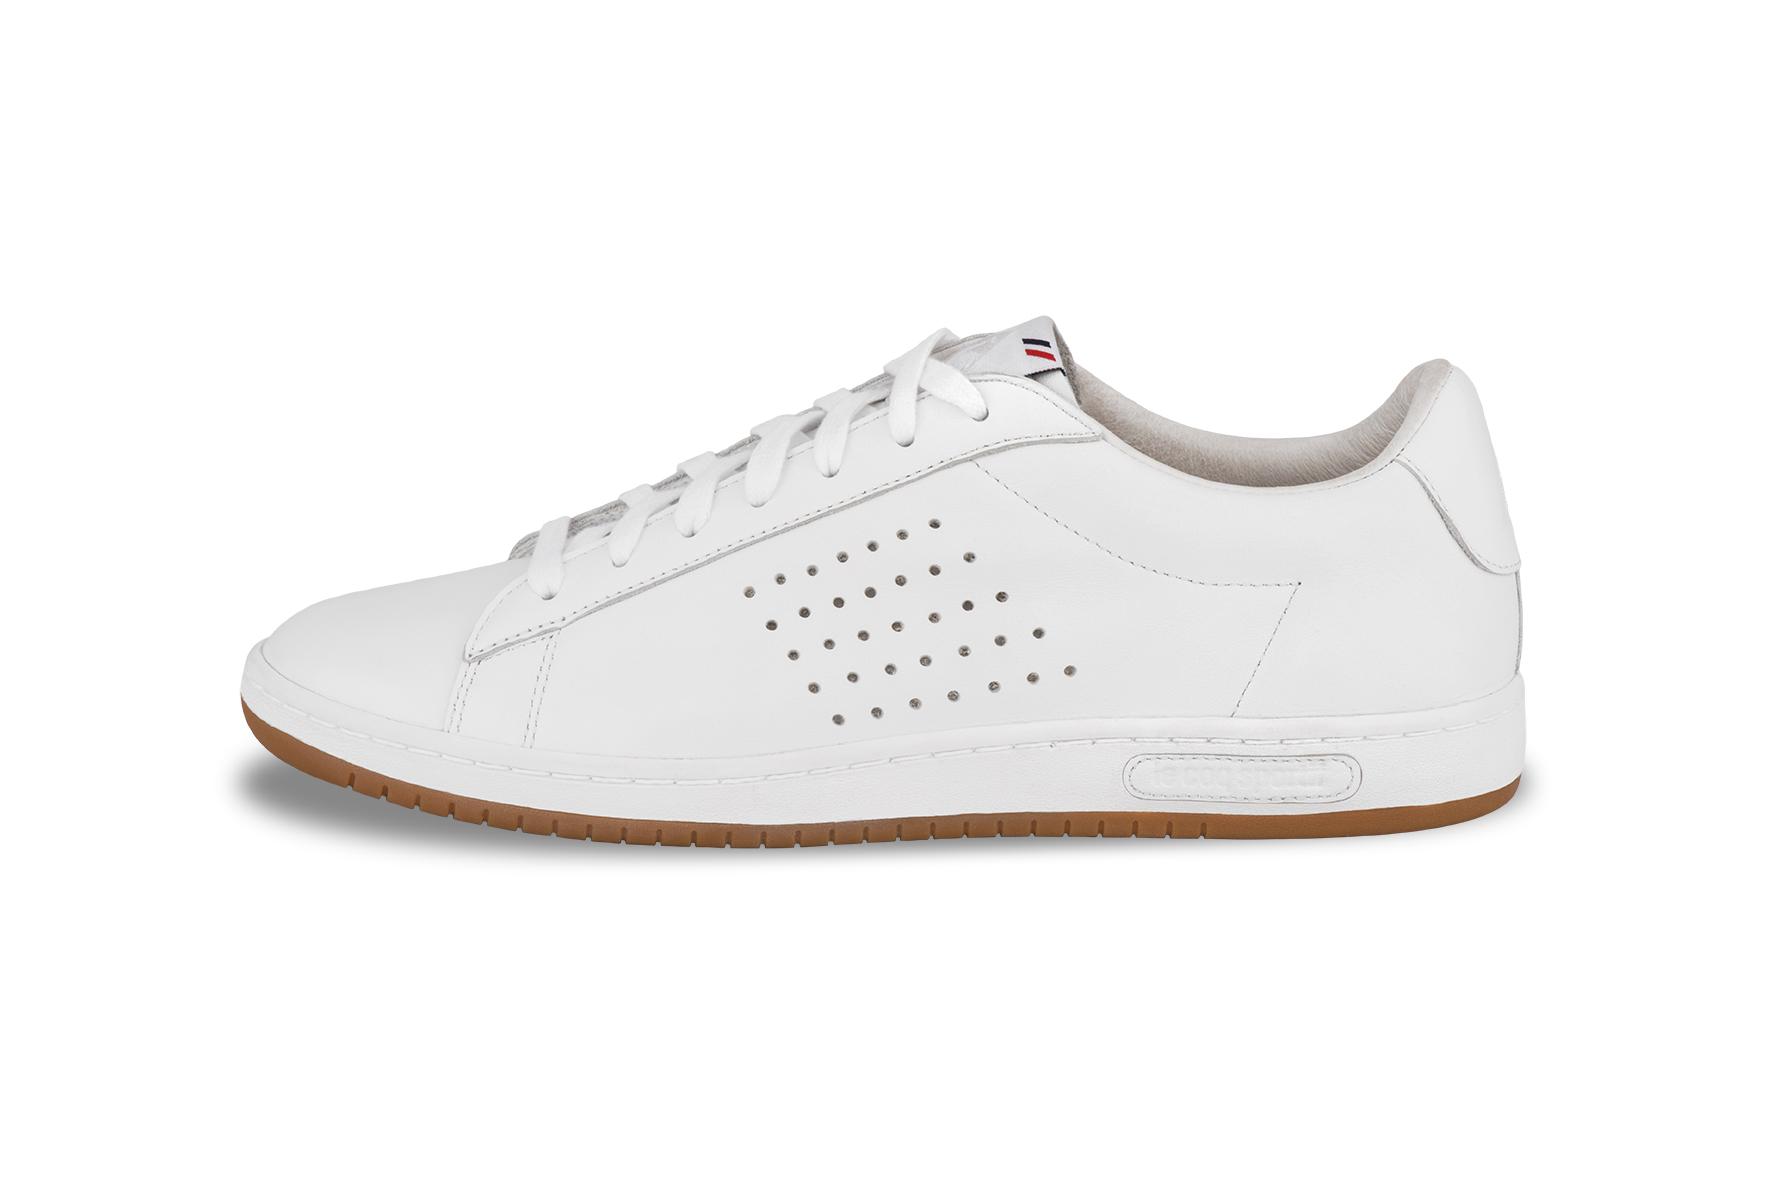 le coq sportif arthur ashe made in france colette 08 sneakers addict. Black Bedroom Furniture Sets. Home Design Ideas